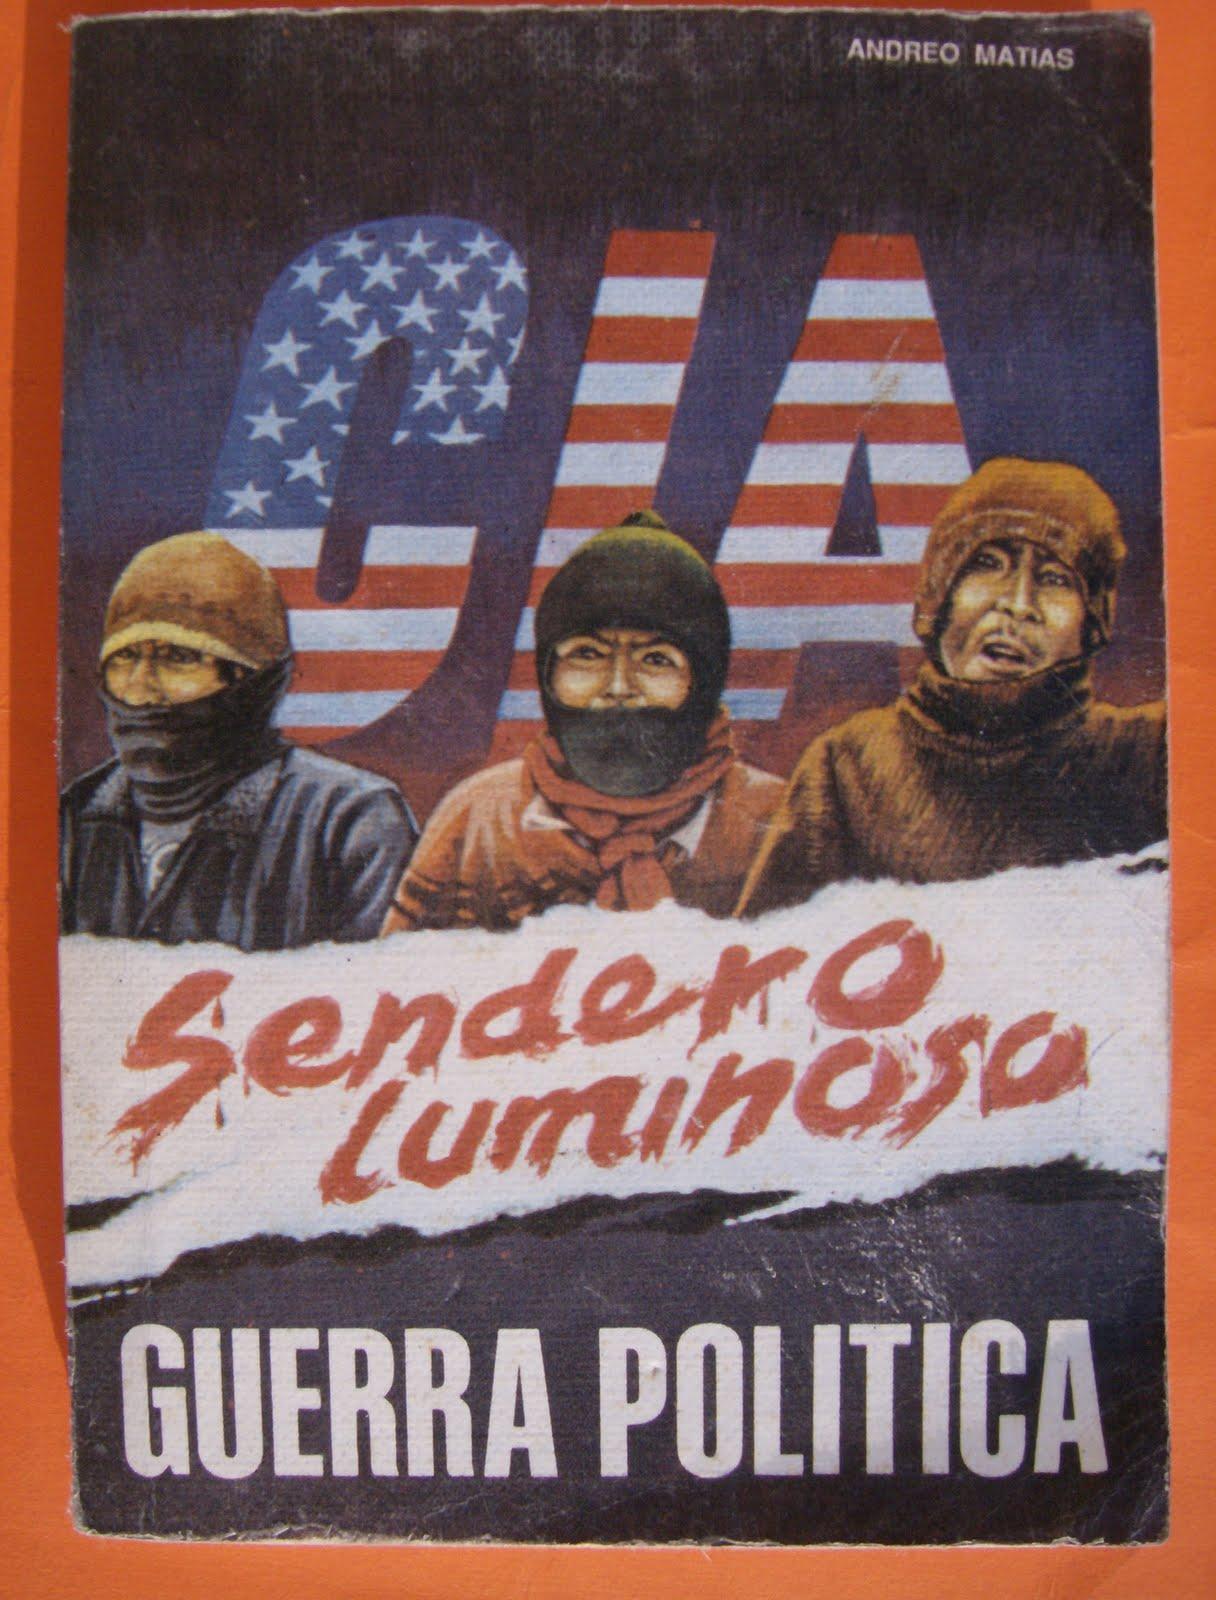 Sendero Luminoso - The Shining Path. CIA%2B-%2BSENDERO%2BLUMINOSO%2BGUERRA%2BPOL%25C3%25ADTICA.%2BAndreo%2BMat%25C3%25ADas.